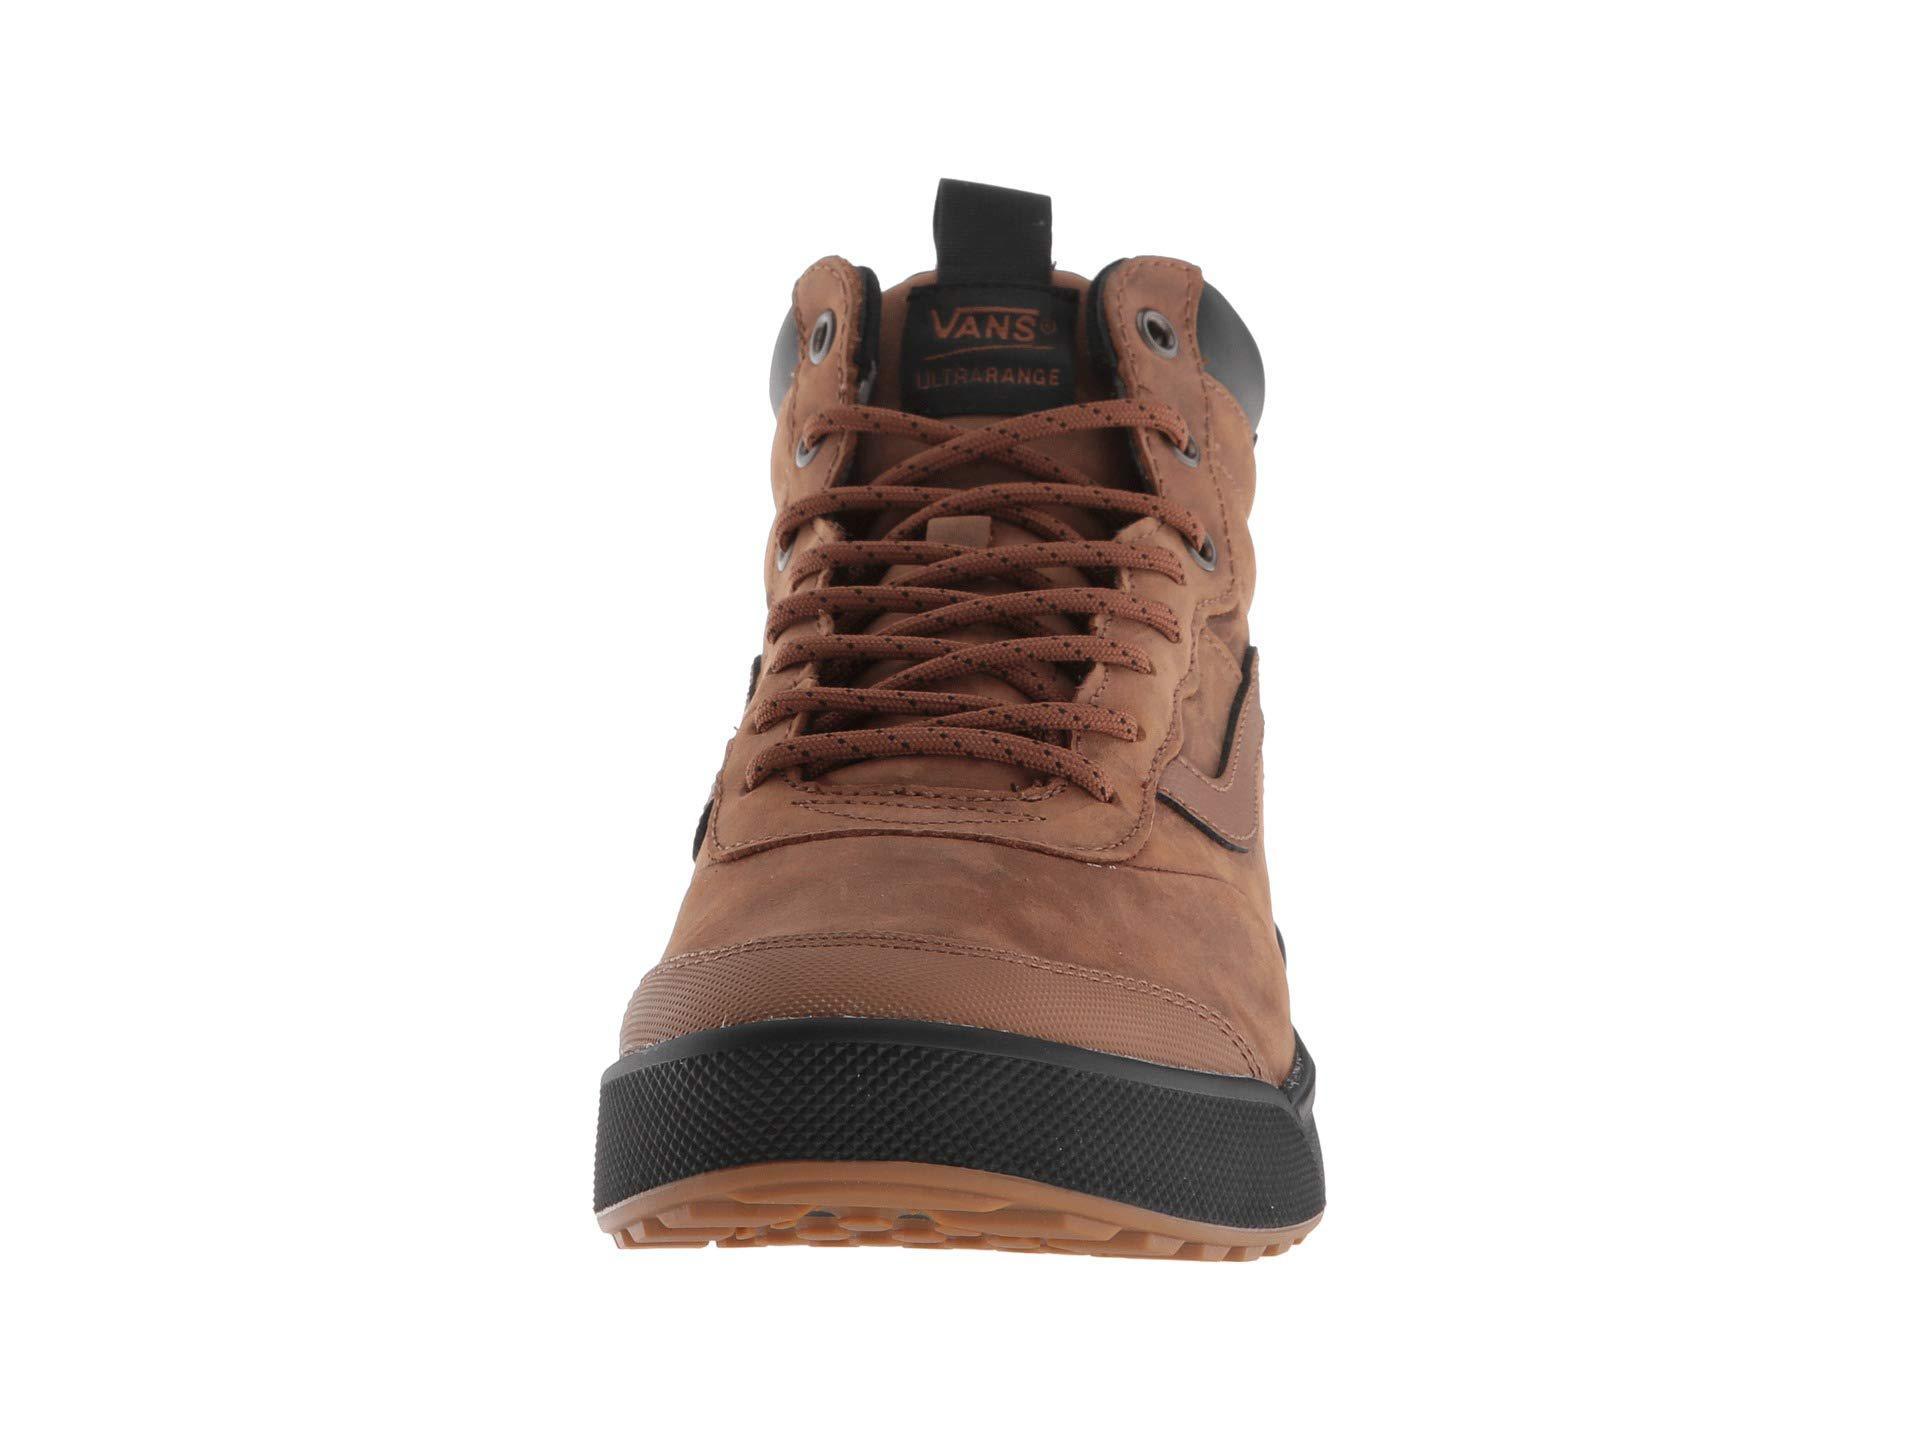 Lyst - Vans Ultrarange Hi Mte (bress Blues black) Men s Skate Shoes ... a6eeafd92